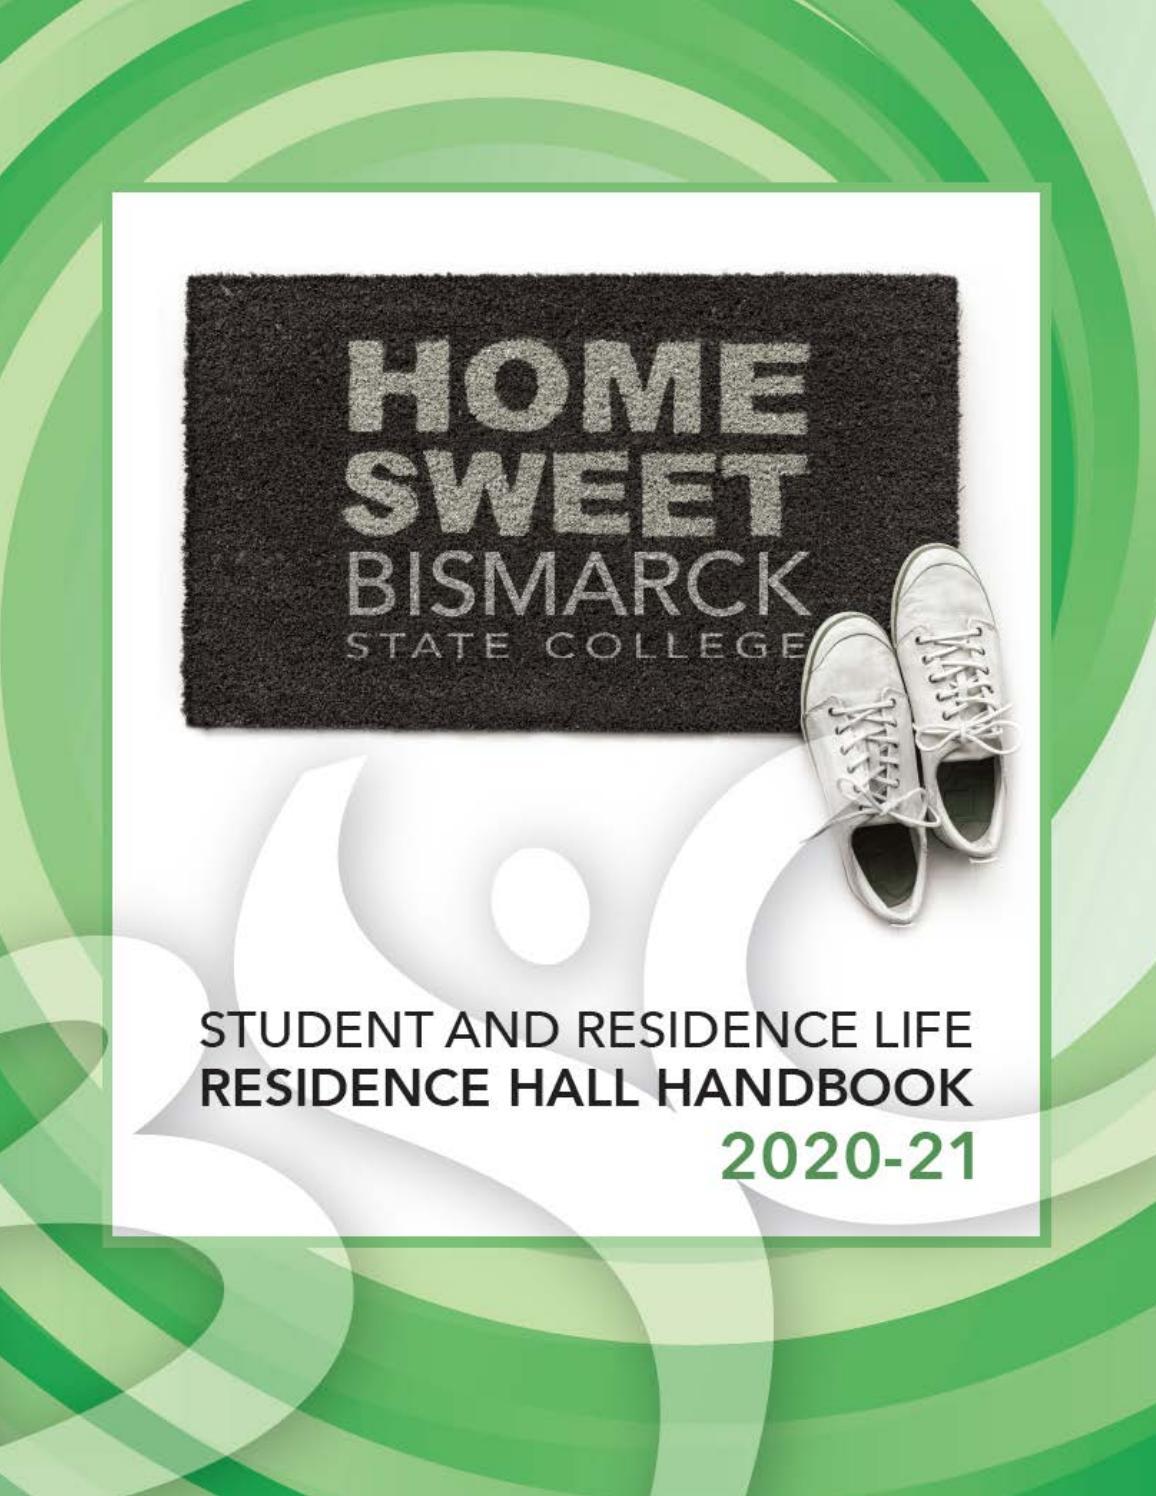 Bsc Residence Hall Handbook 2020 21 By Bismarck State College Issuu